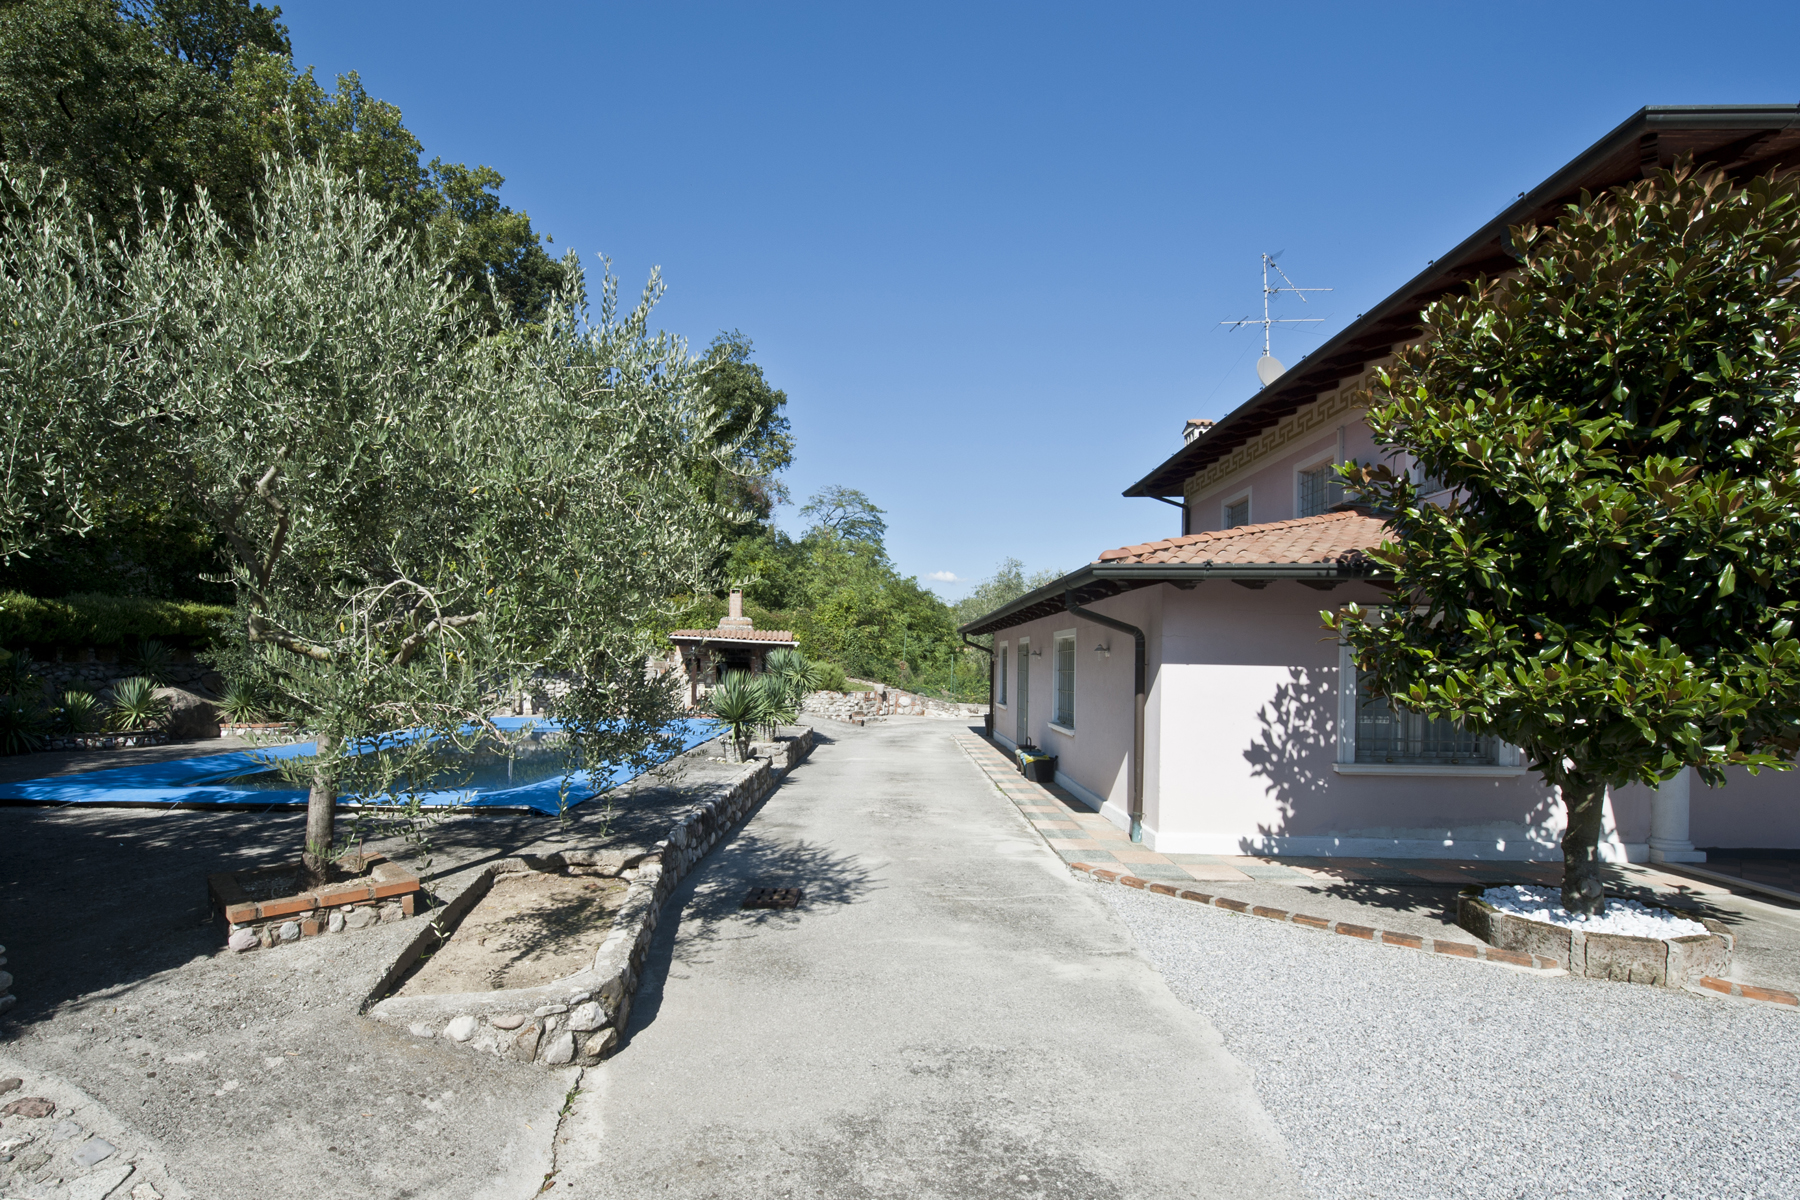 Villa in Vendita a Padenghe Sul Garda: 5 locali, 400 mq - Foto 13